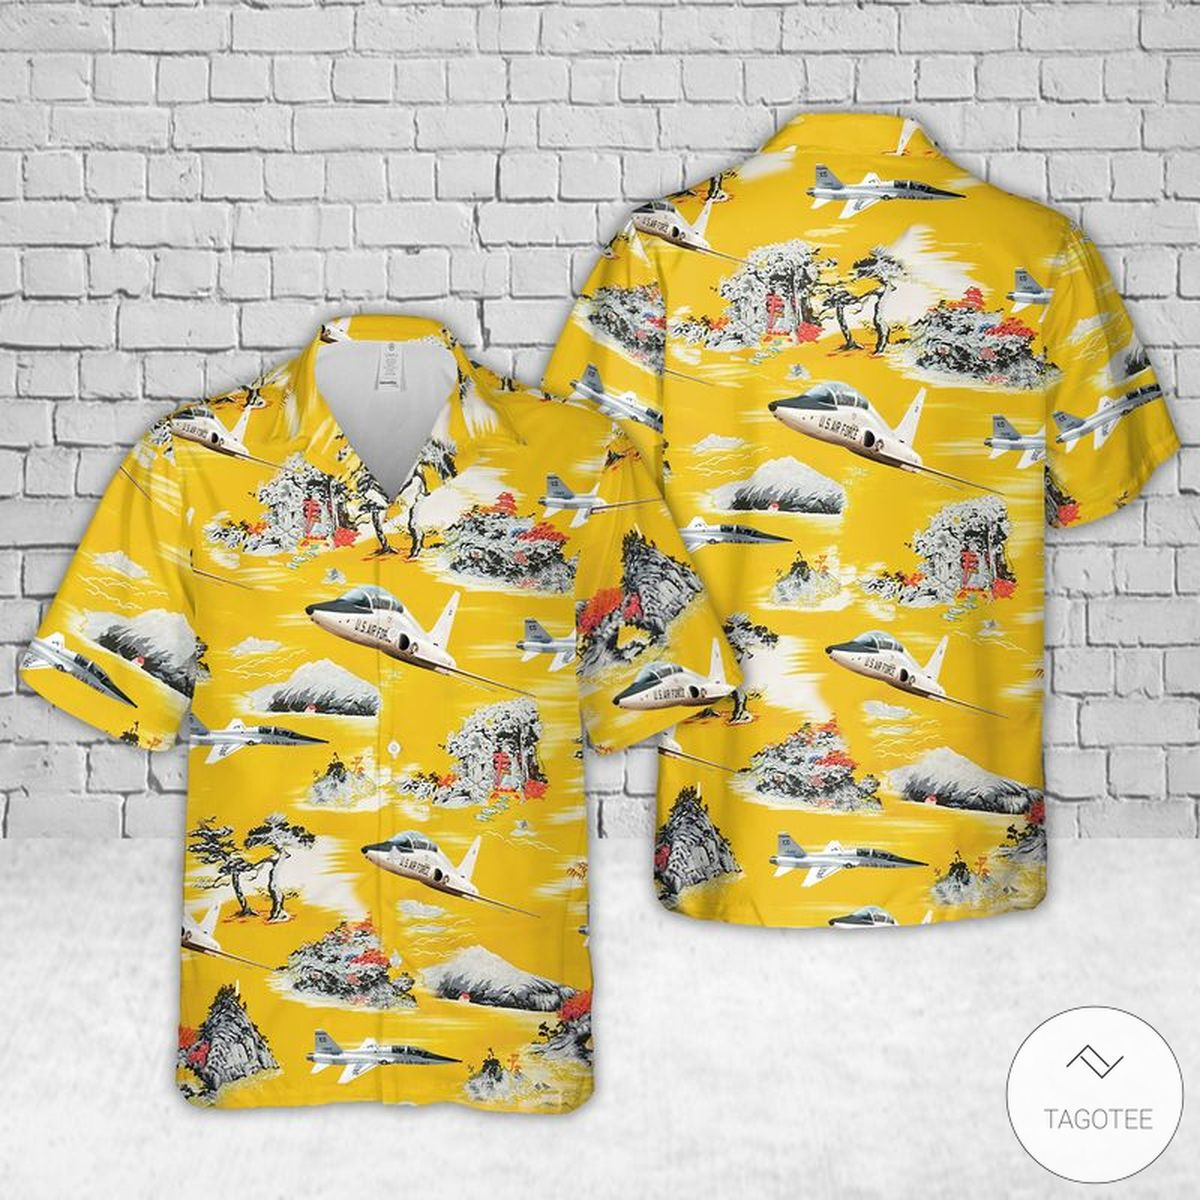 Air Force Northrop T-38 Talon Hawaiian Shirt, Beach Shorts